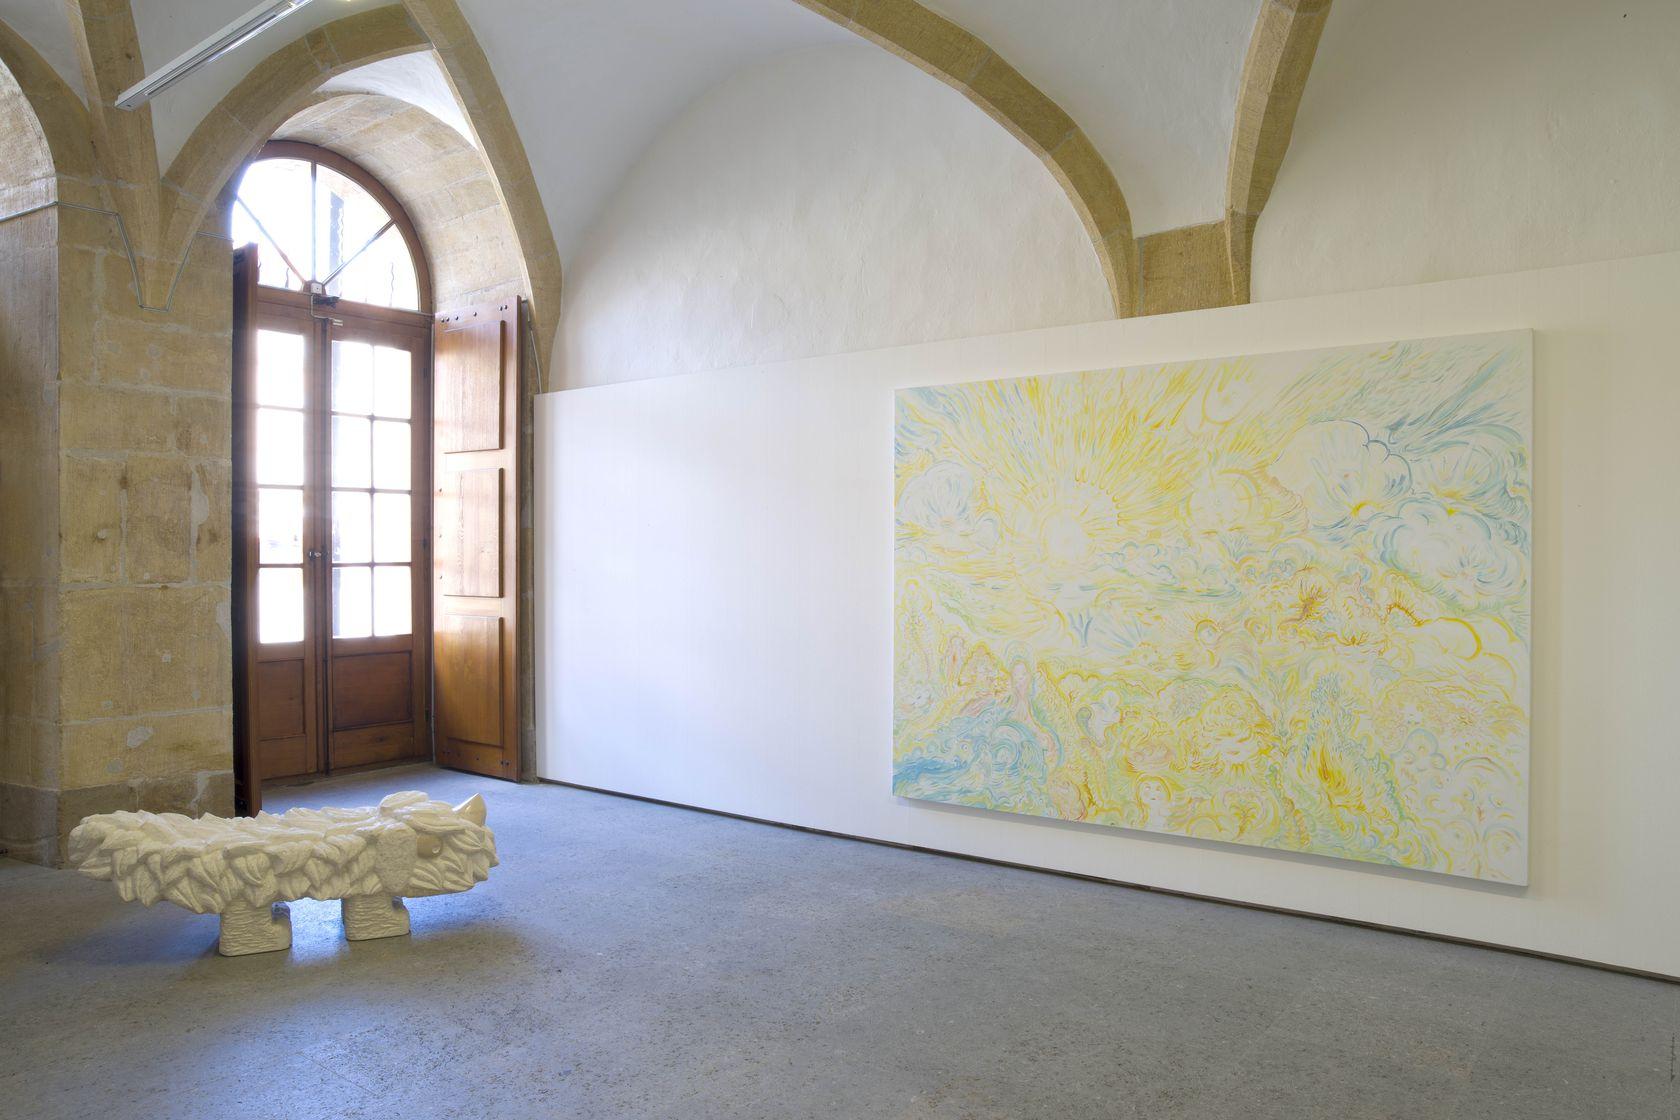 SUPERNATURE, cur. Rolando Bassetti, Centre d'Art Contemporain, Yverdon- les-Bains (CH) June 27 - September 12, 2021 © Claude Cortinovis _CACY 2021